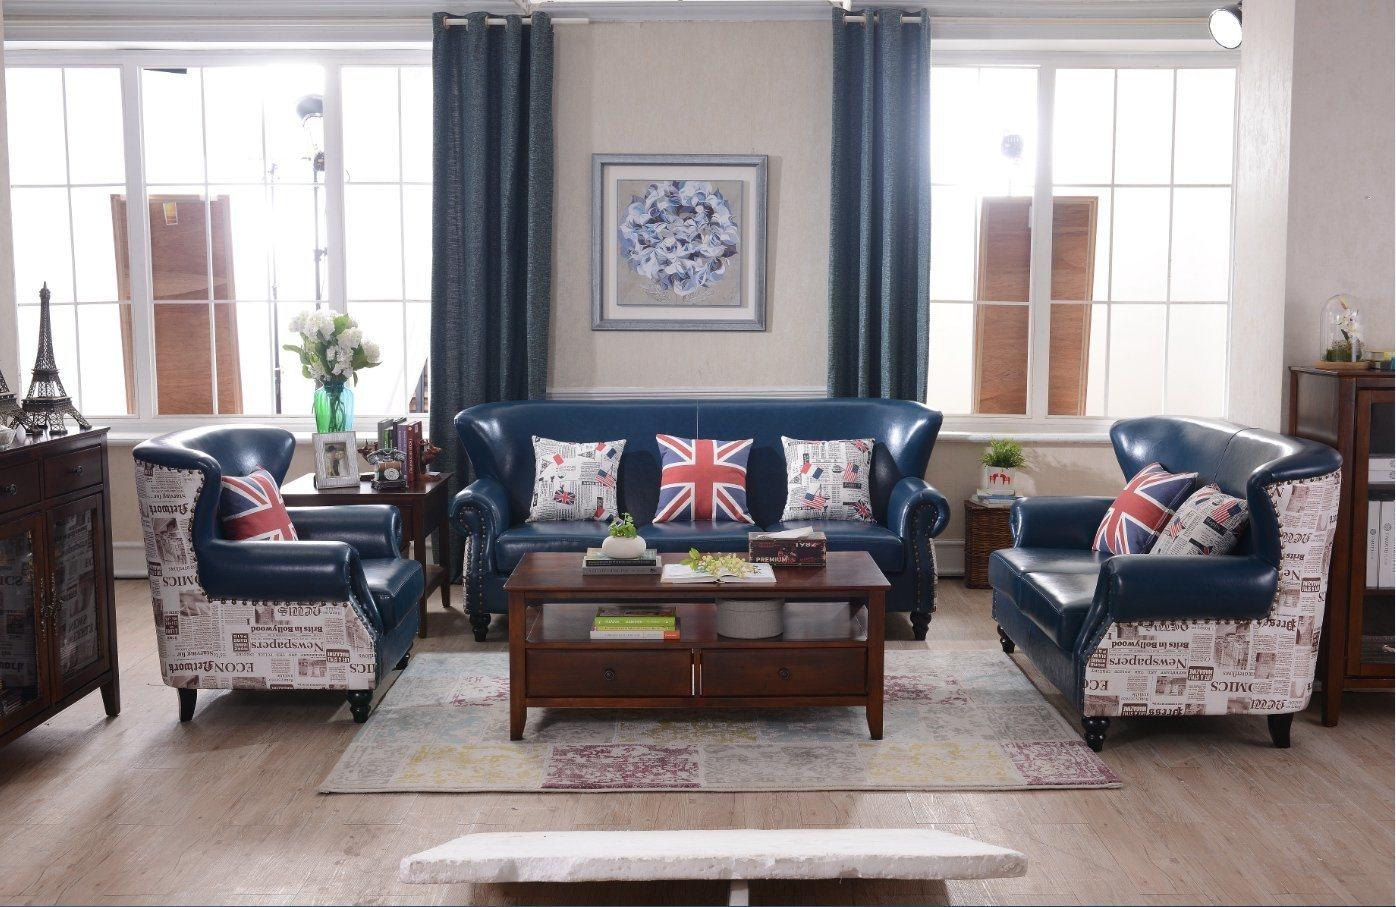 [Hot Item] Sofa Set Designs Modern Lazy Boy Upholstery Sofa Fabric Couch  Living Room Sofa